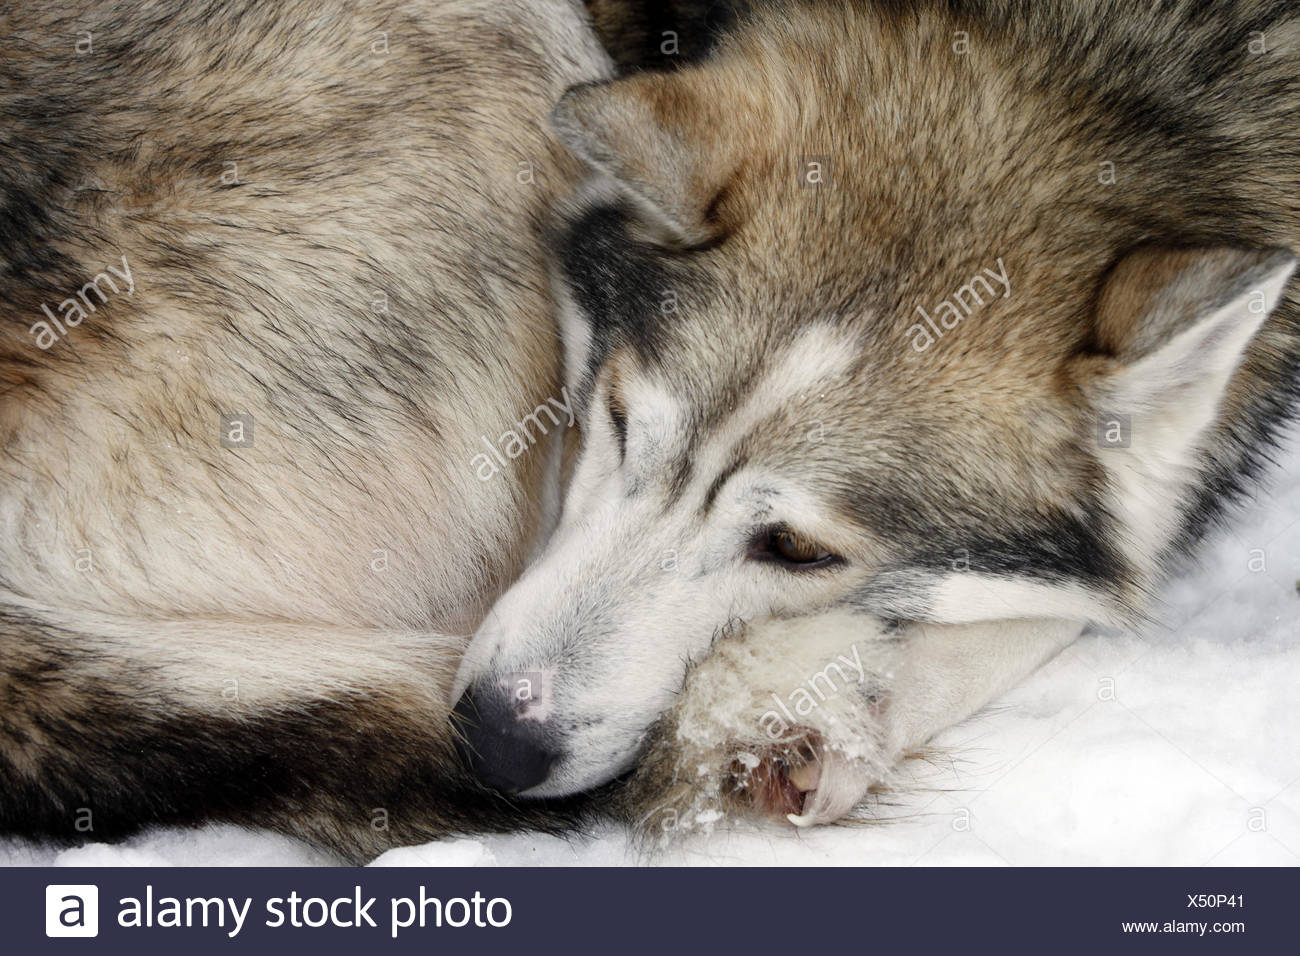 Sleeping Siberian Husky in snow - Stock Image